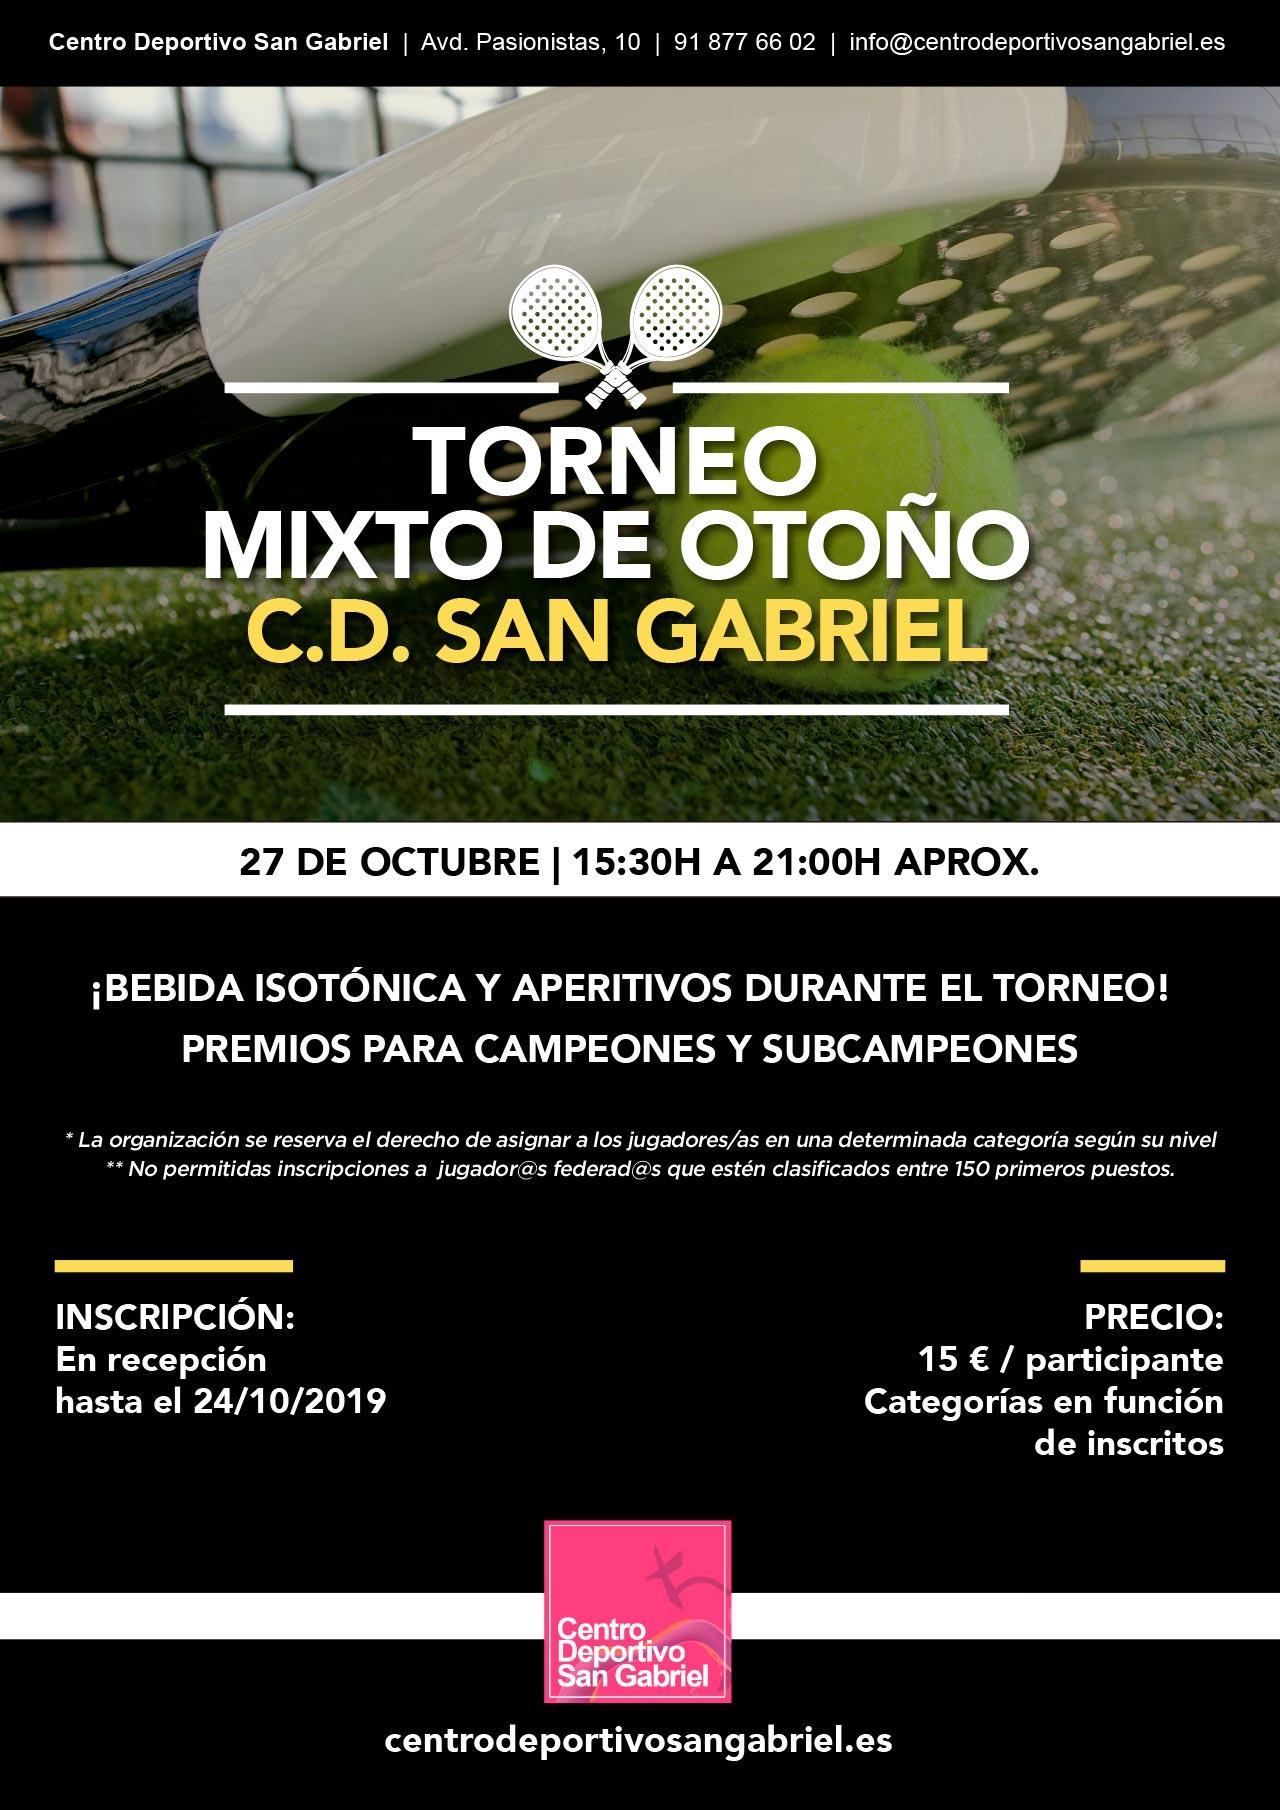 Torneo pádel mixto Otoño en San Gabriel